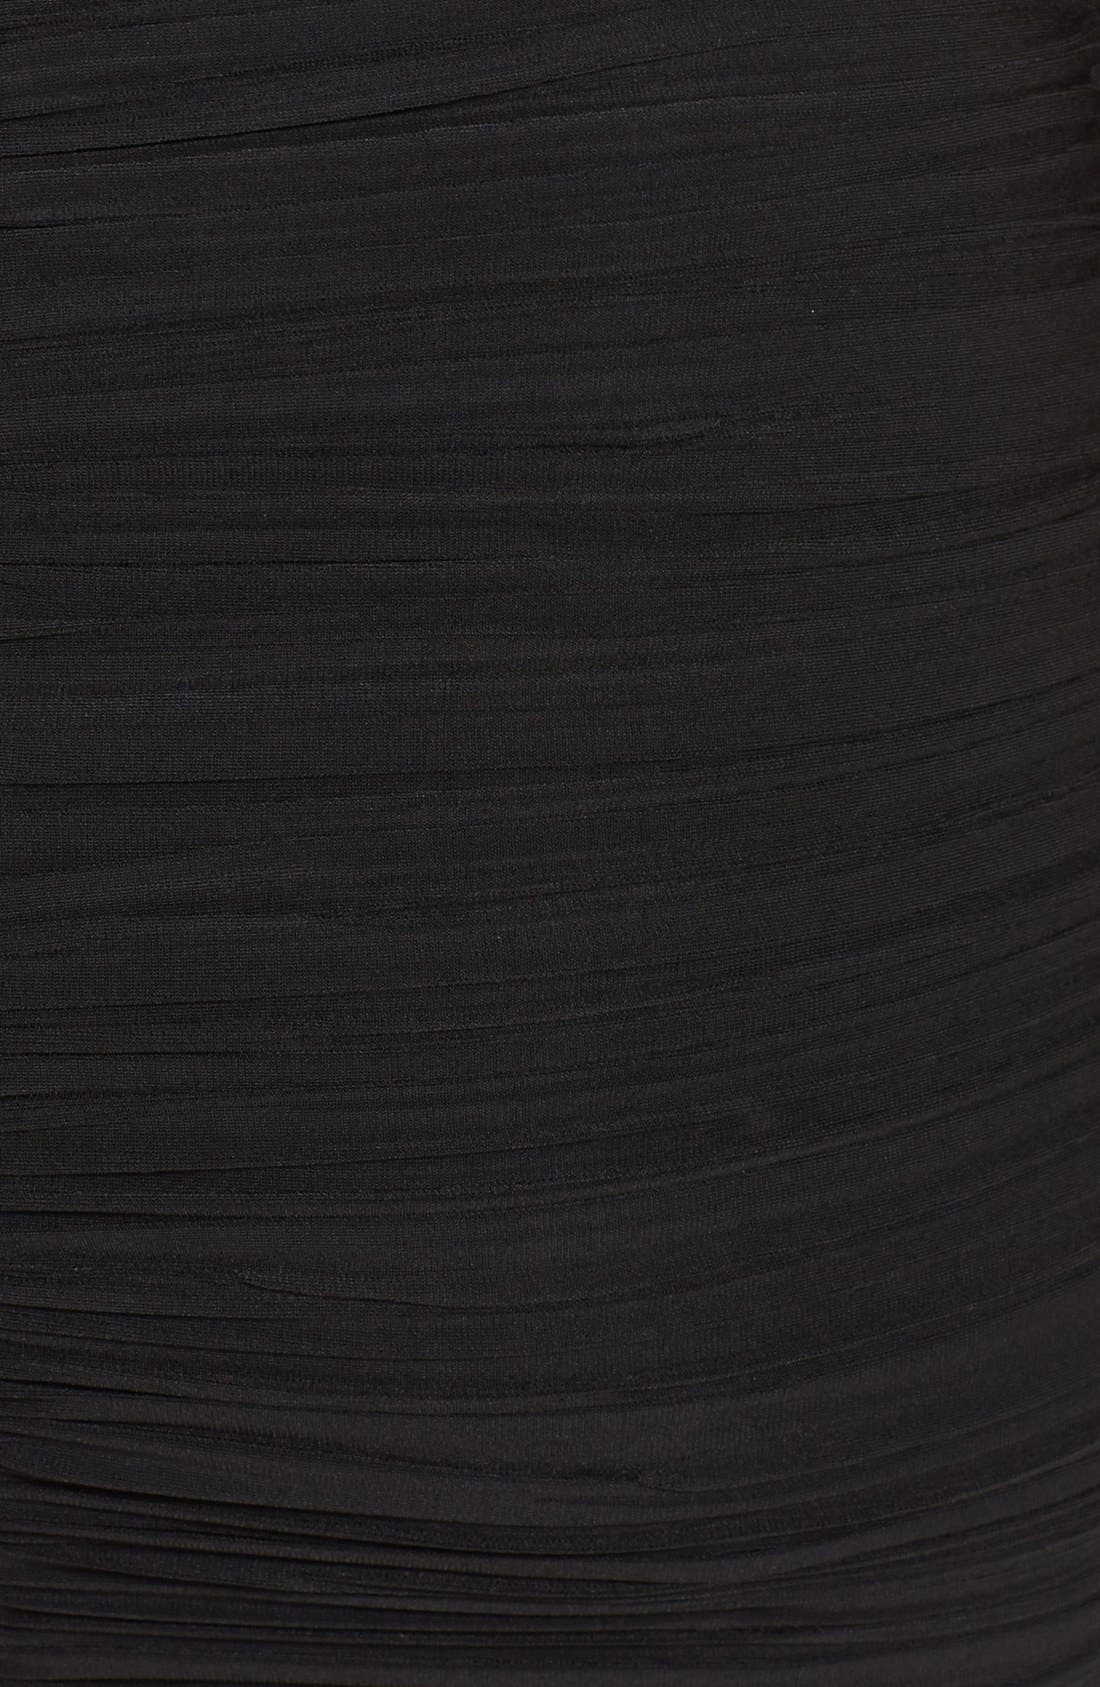 Alternate Image 3  - BCBGMAXAZRIA Ruched Cutout Jersey Minidress